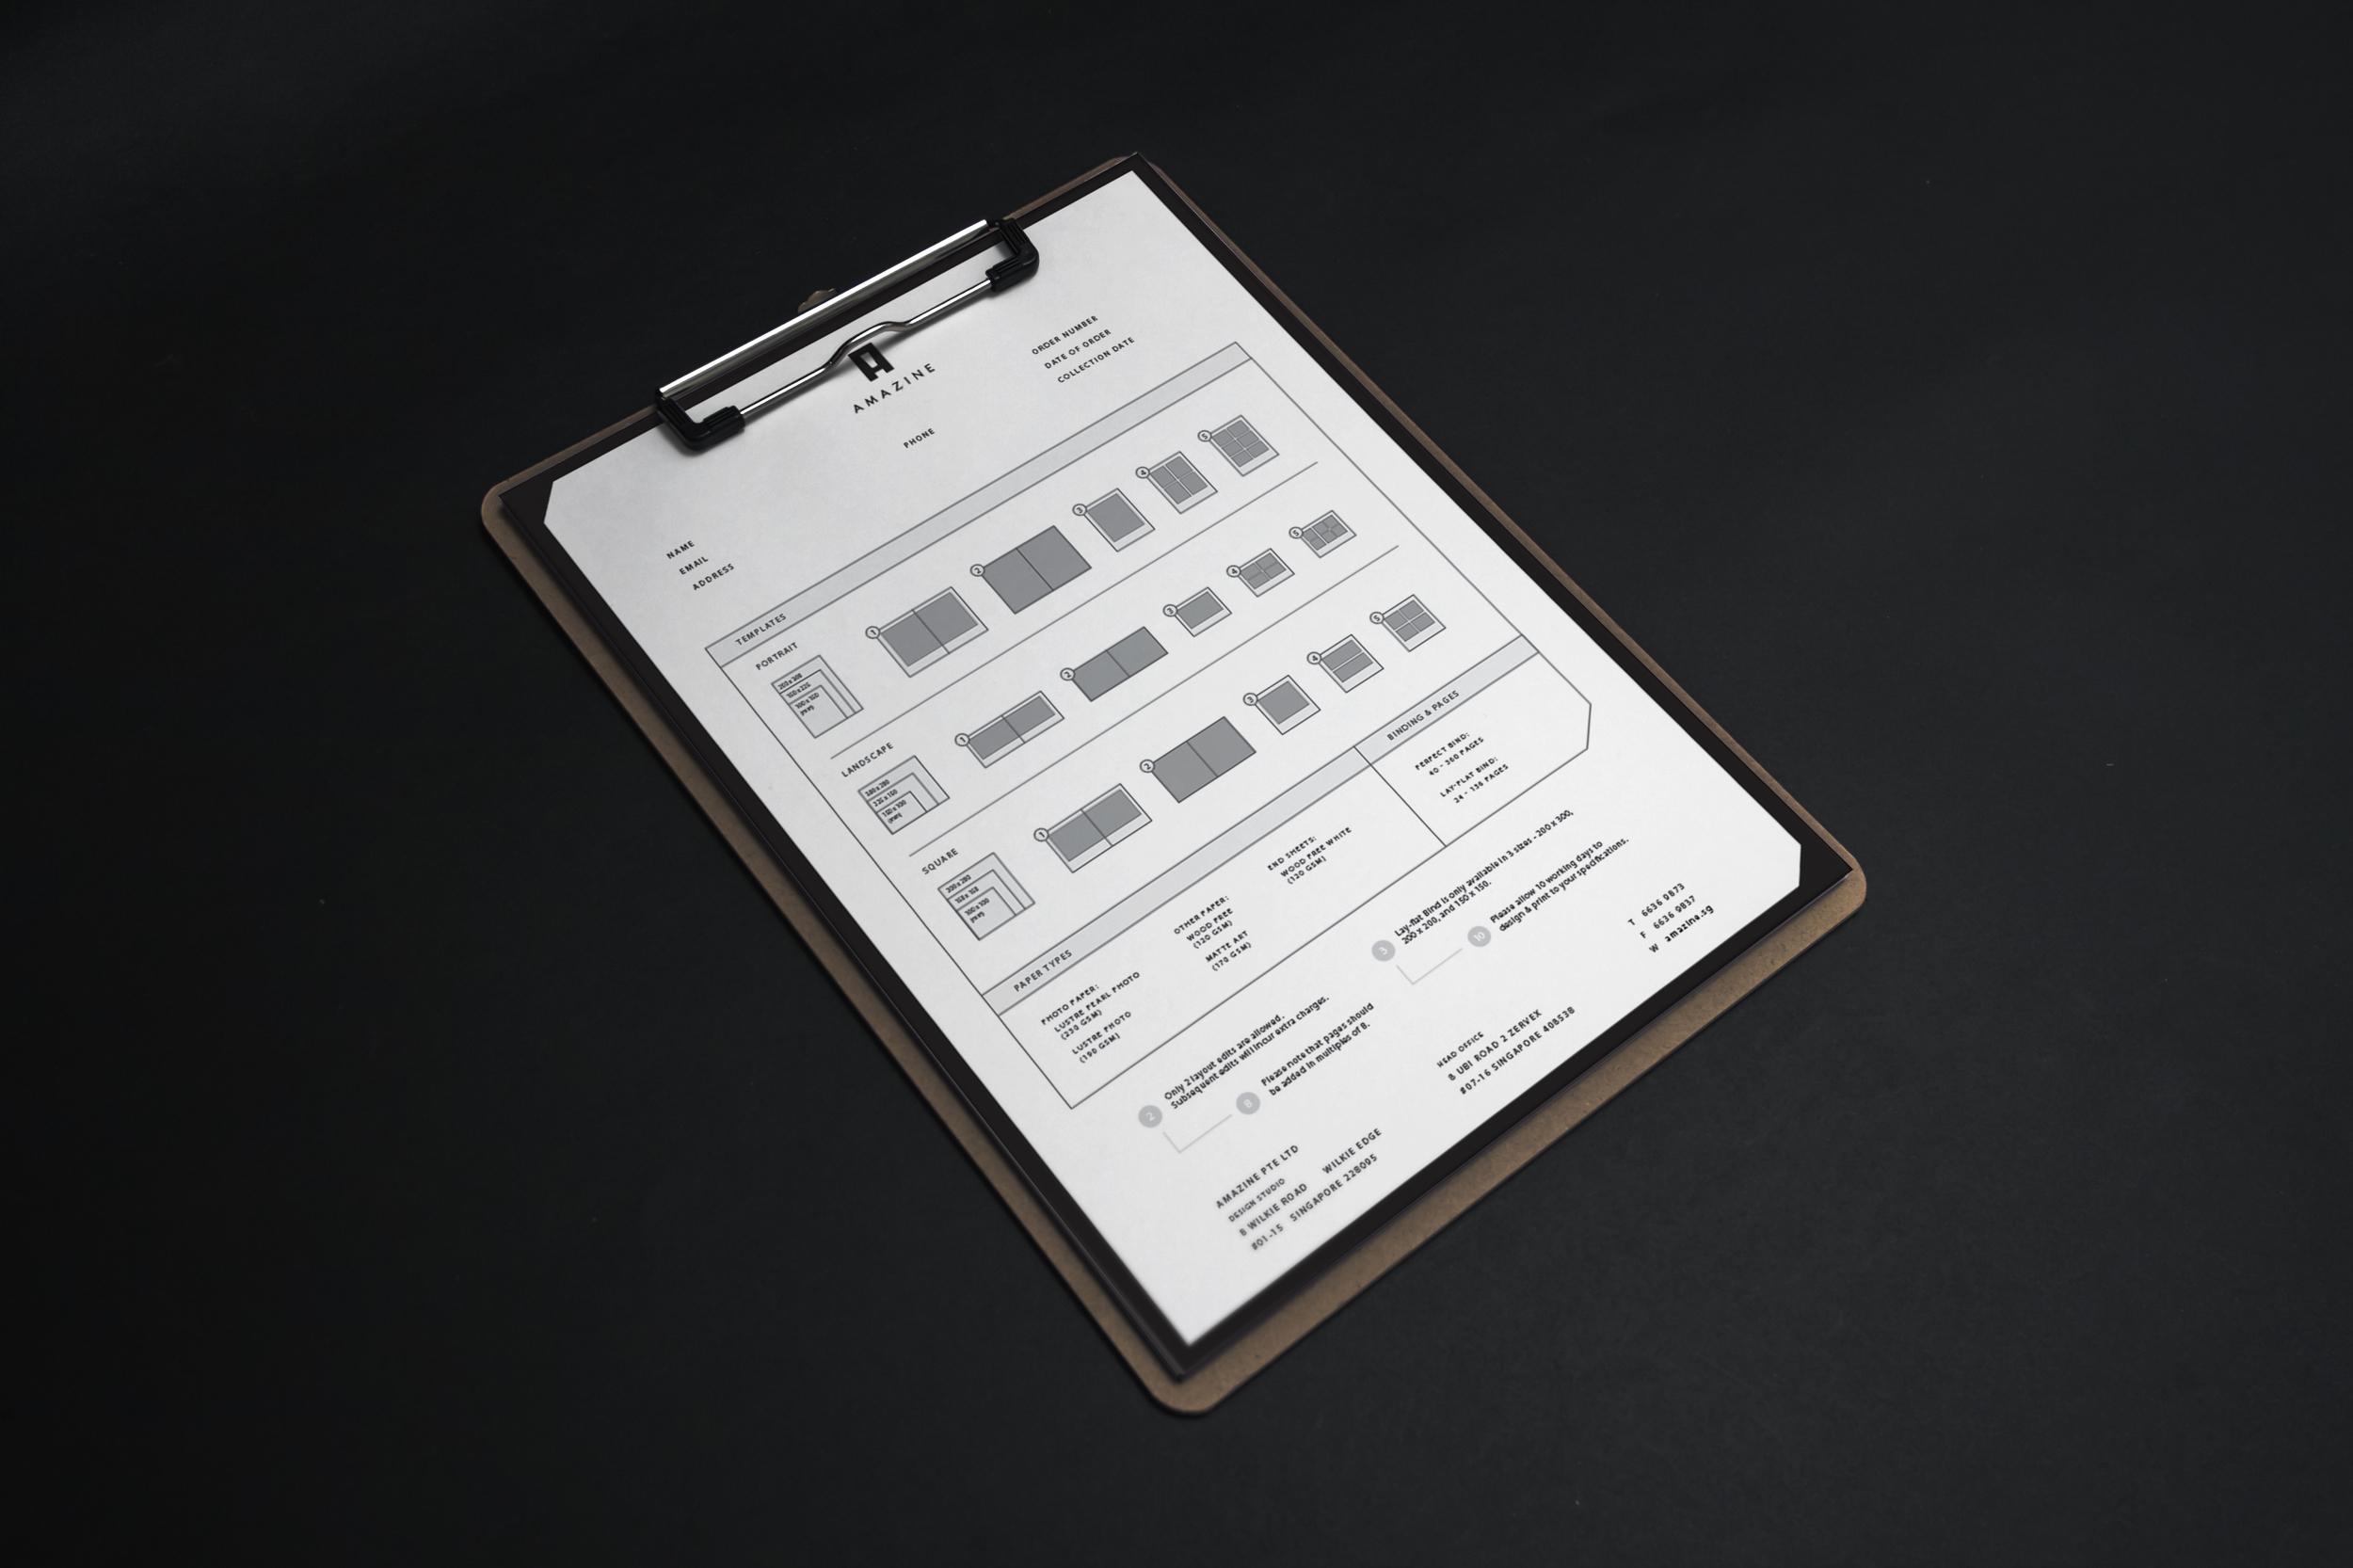 Clipboard Mockup 1 - Infinity - originalmockups.com.jpg